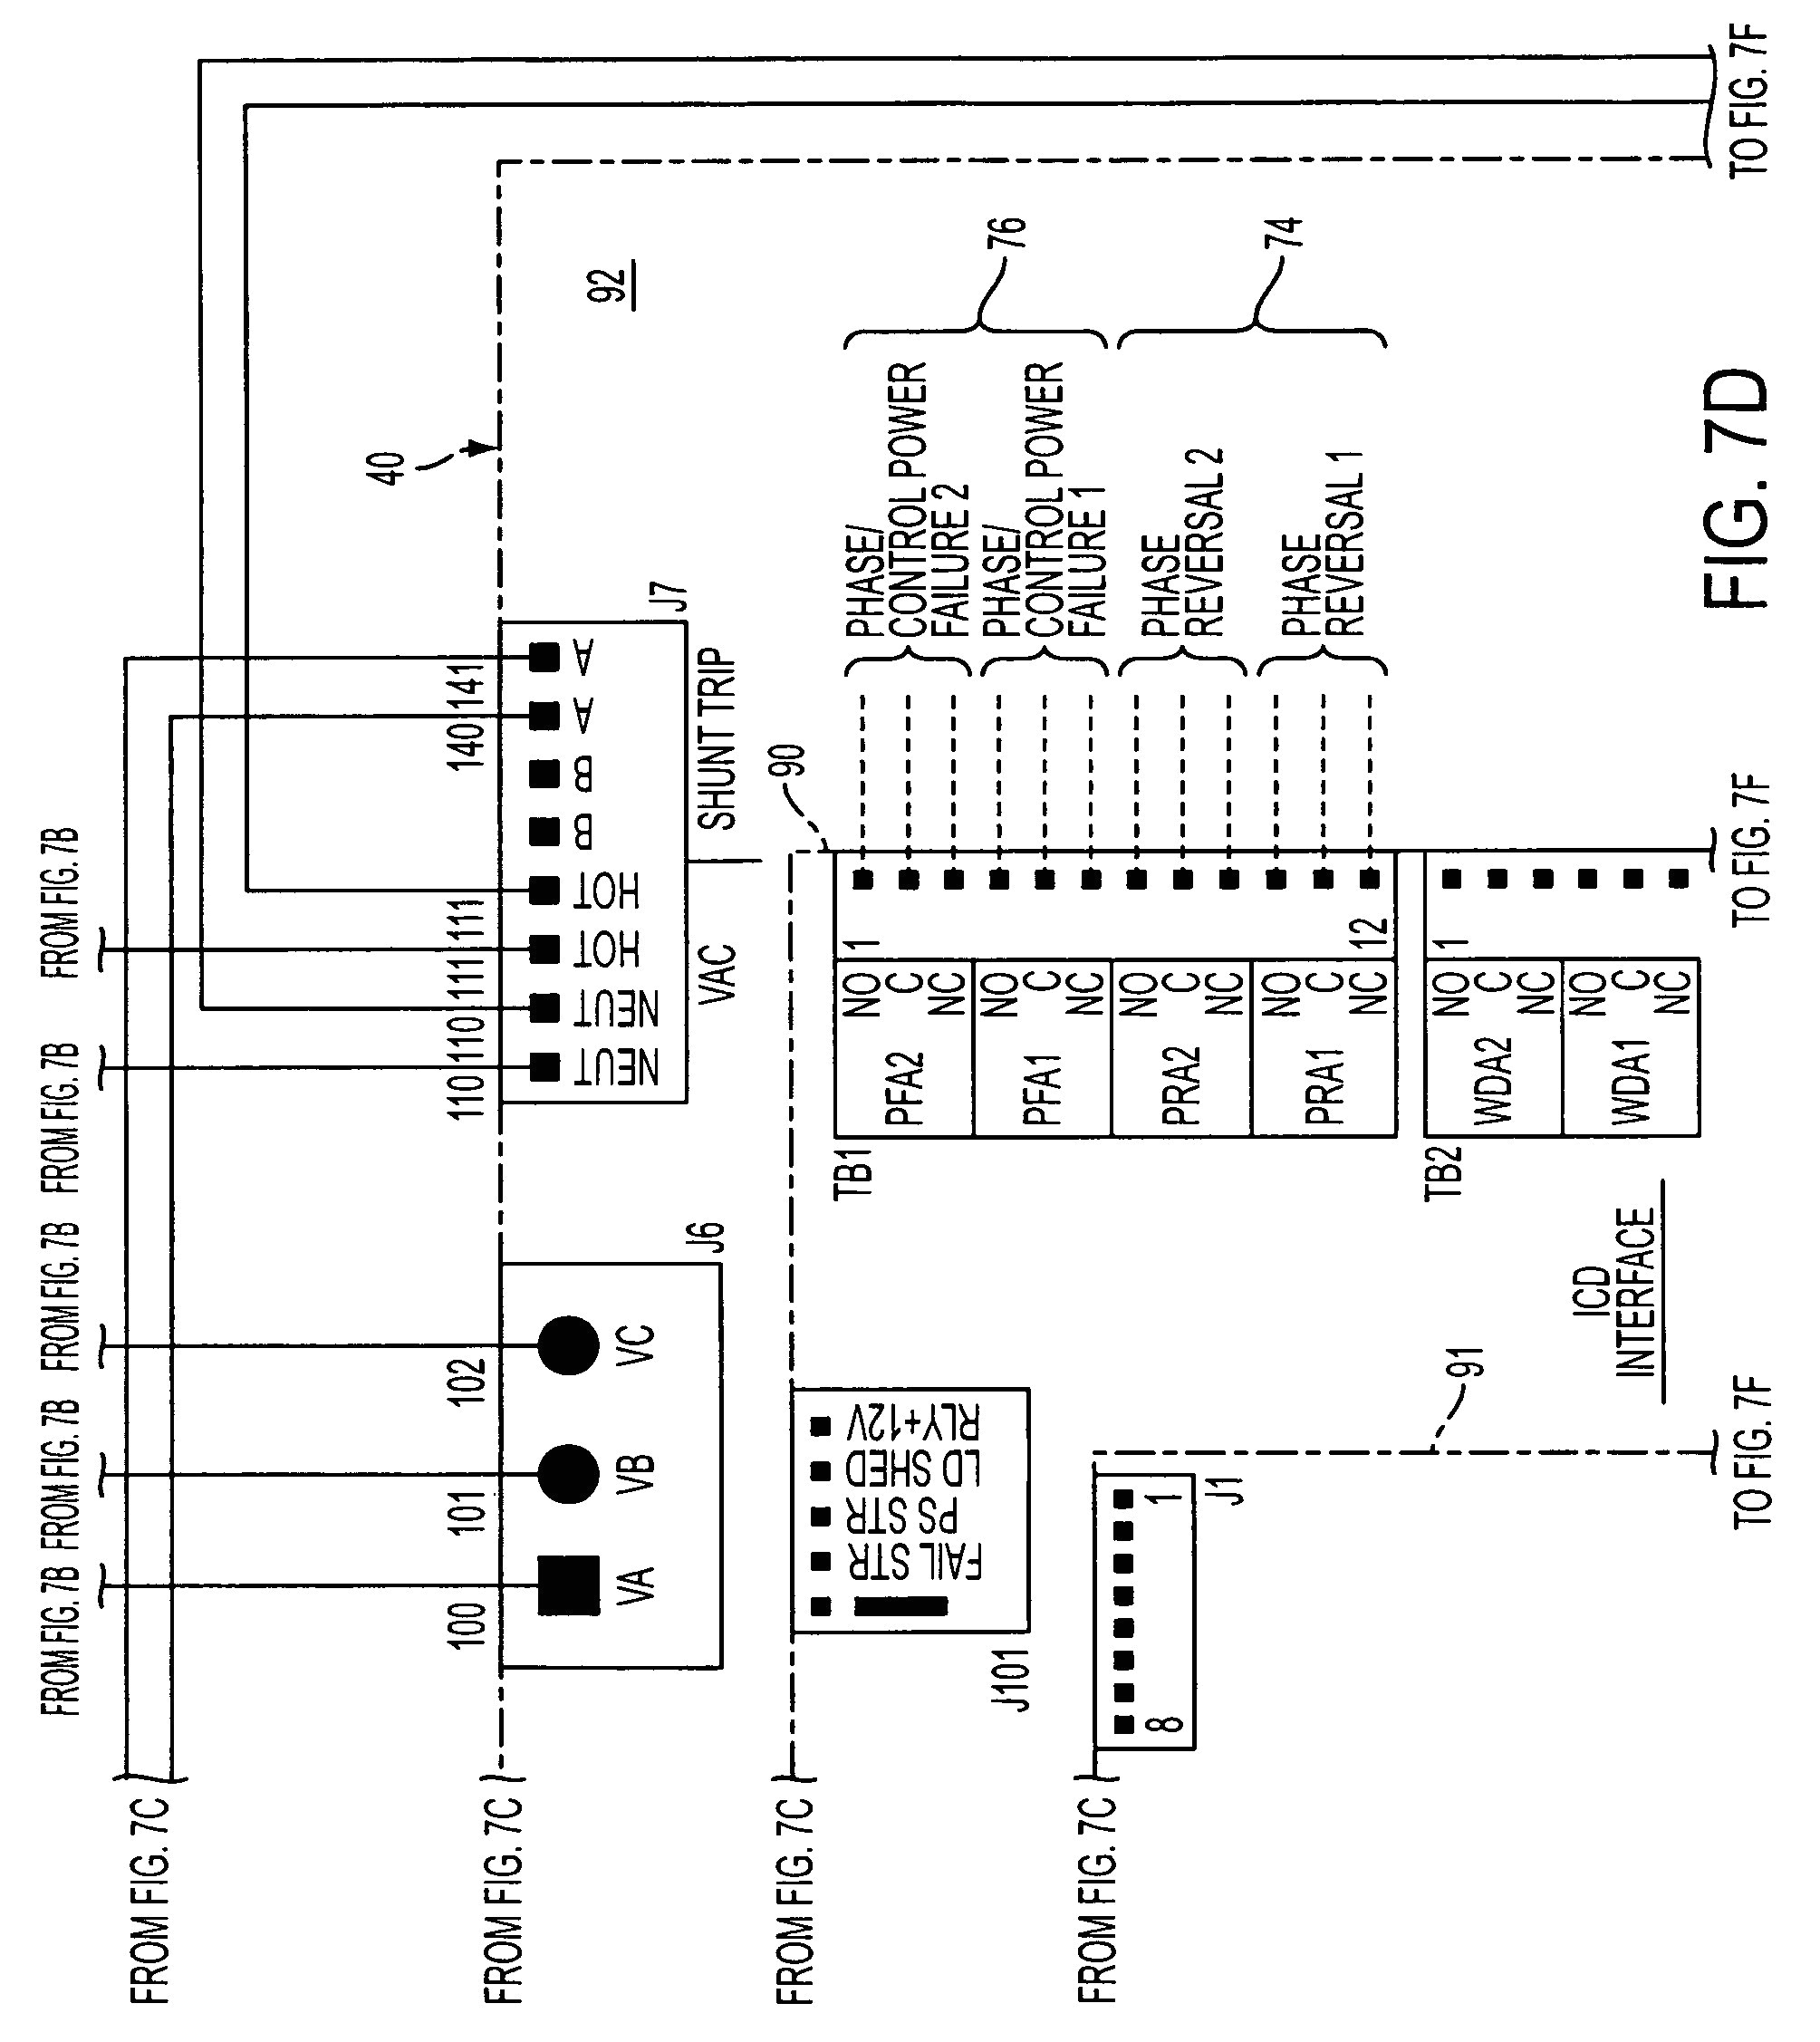 adt wiring diagram wiring diagram technic phone wiring diagram adt wiring diagram home alarm wiring diagram